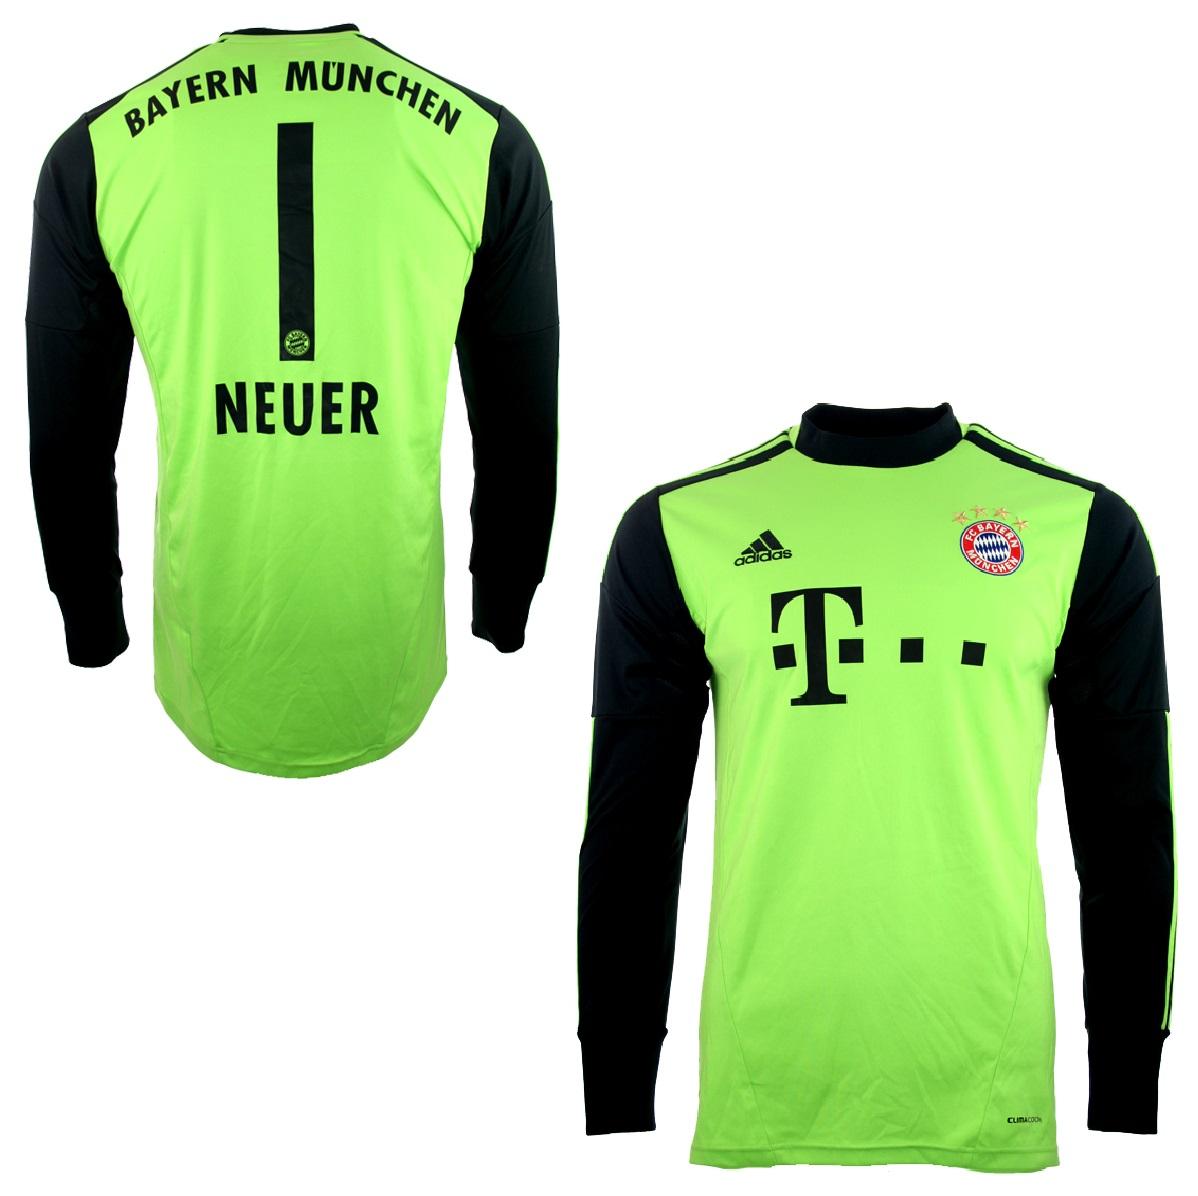 Adidas FC Bayern München Torwart Trikot 1 Manuel Neuer 2012